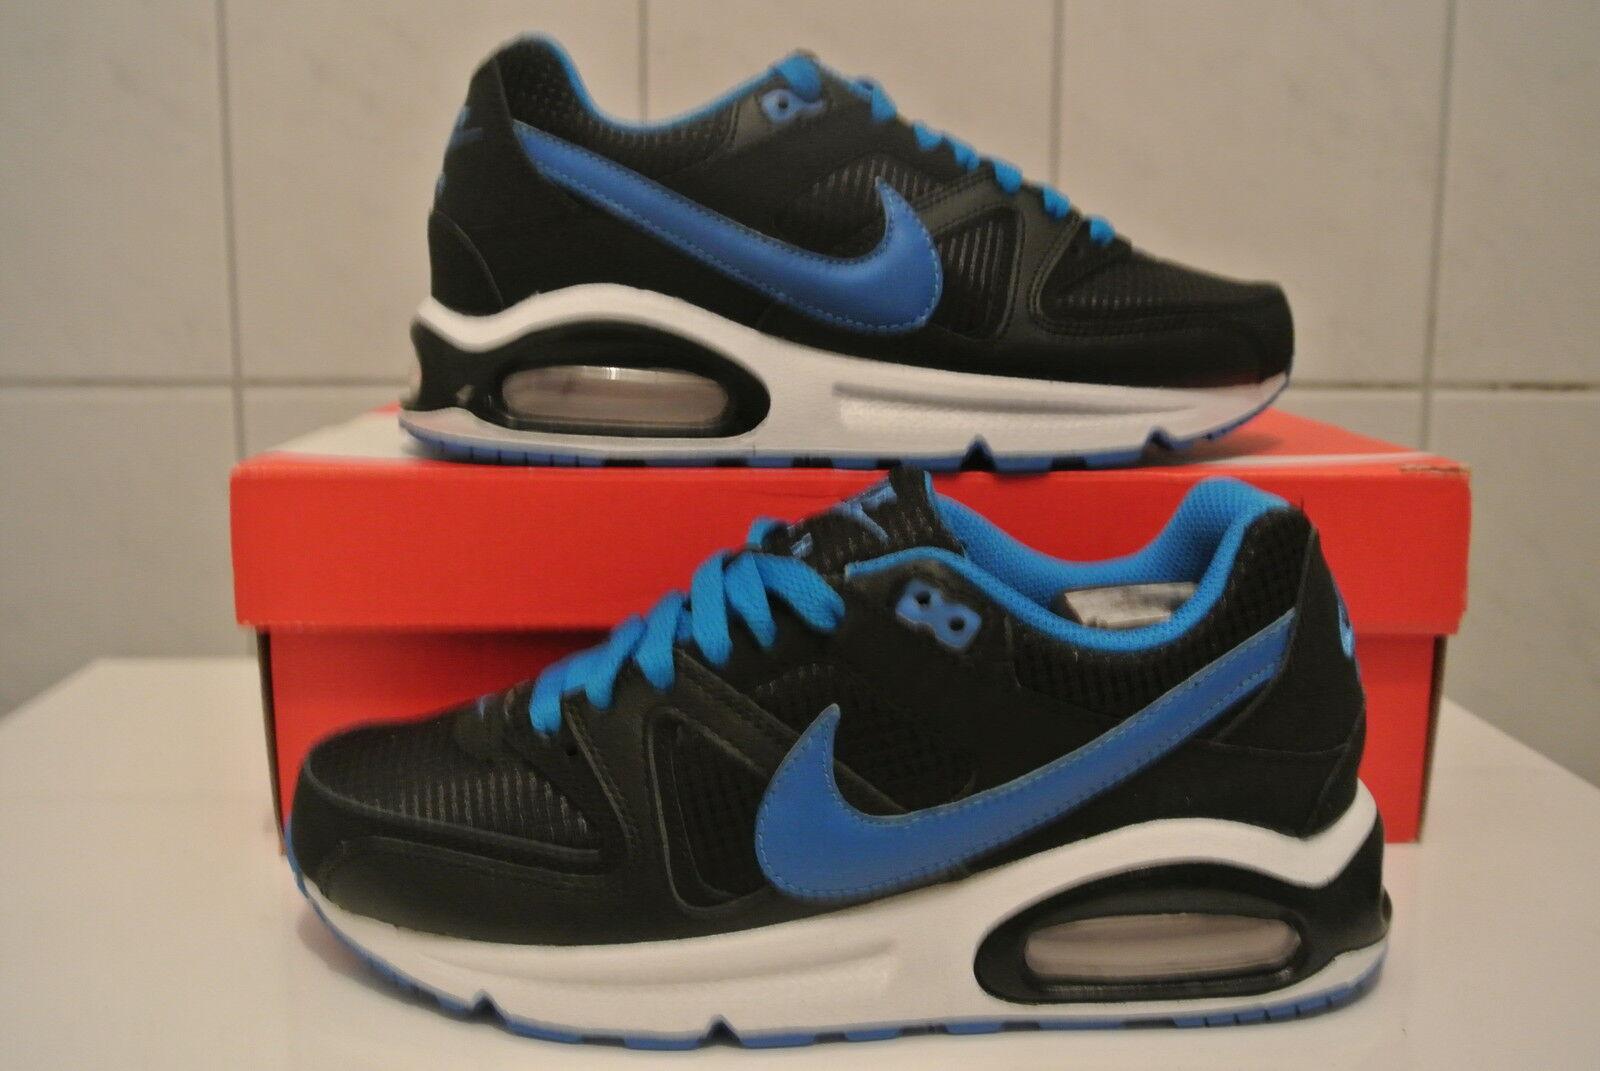 Nike  Air Max Command FB  Nike Gr. wählbar Neu & OVP 705391 001 229f32